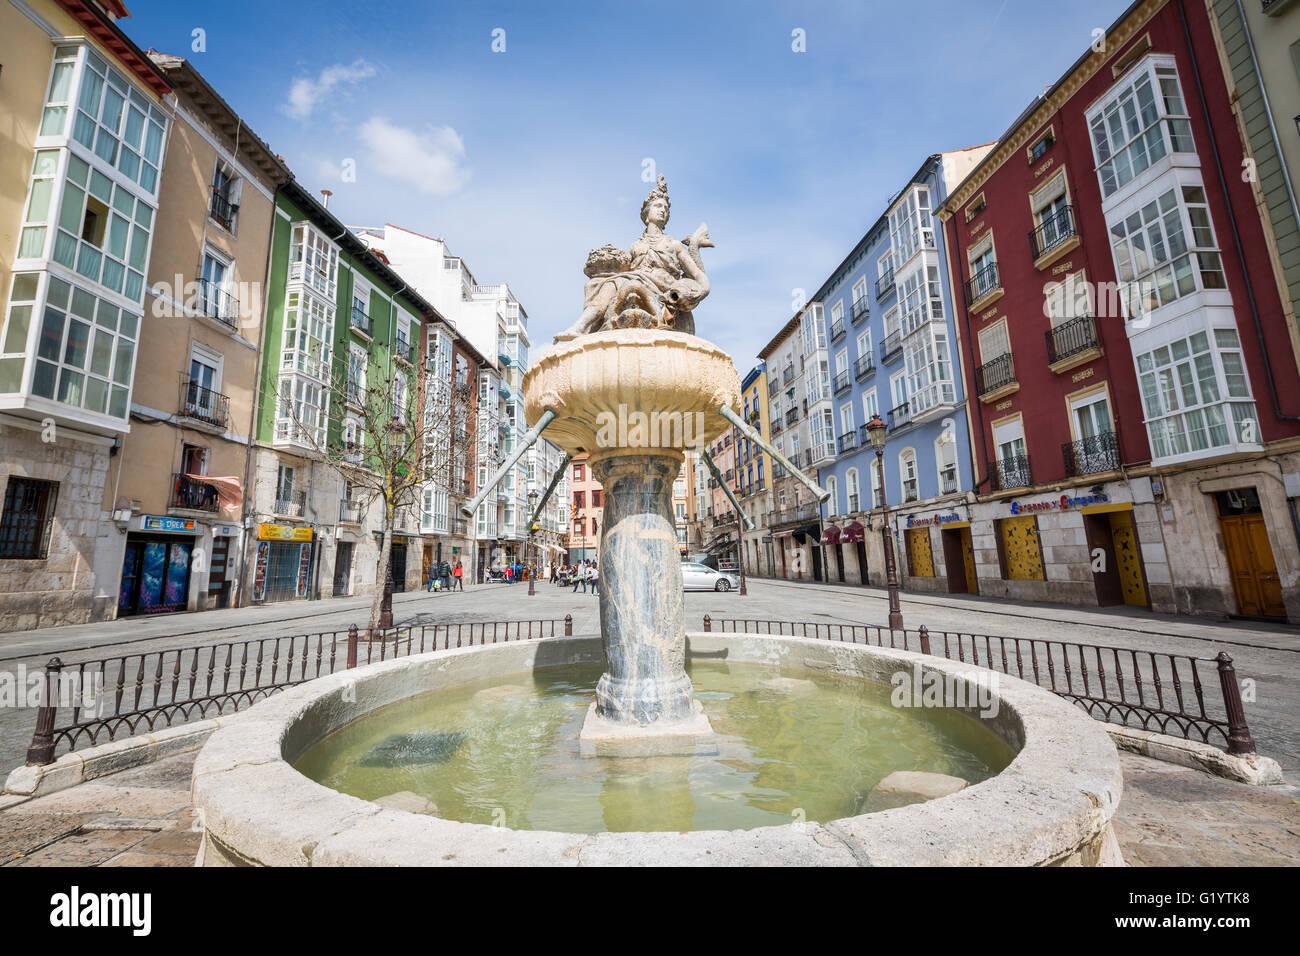 Camino de Santiago pilgrimage journey from St Jean Pied de Port, France to Burgos Spain. - Stock Image